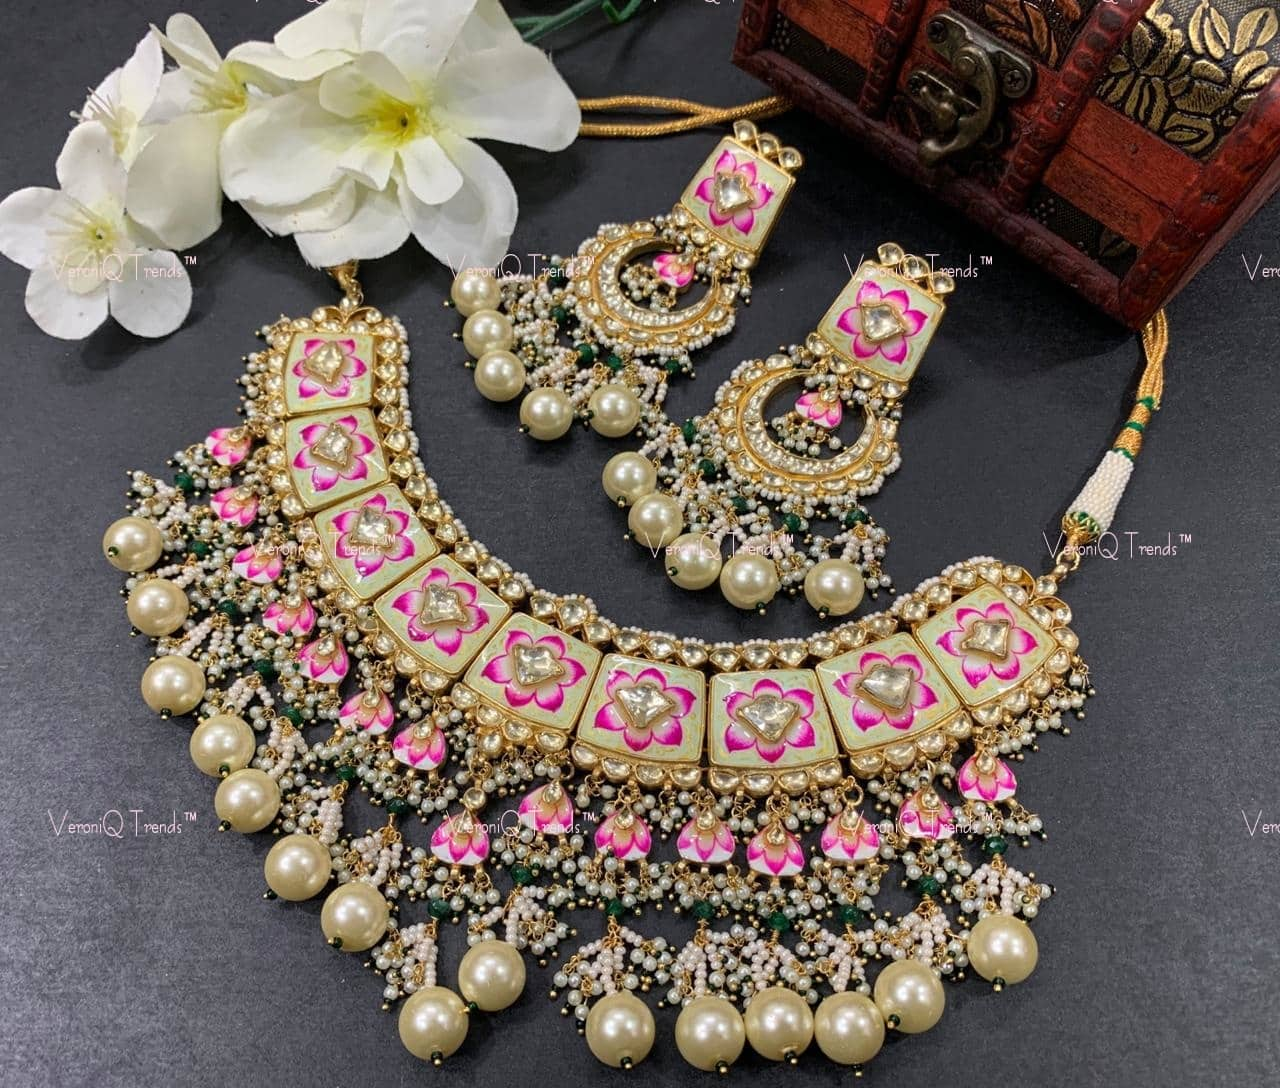 Designer KundanPolki Full Coverage heavy Bridal Necklace Set in Multilayer Kundan Meenakari Work D55 VeroniQ Trends